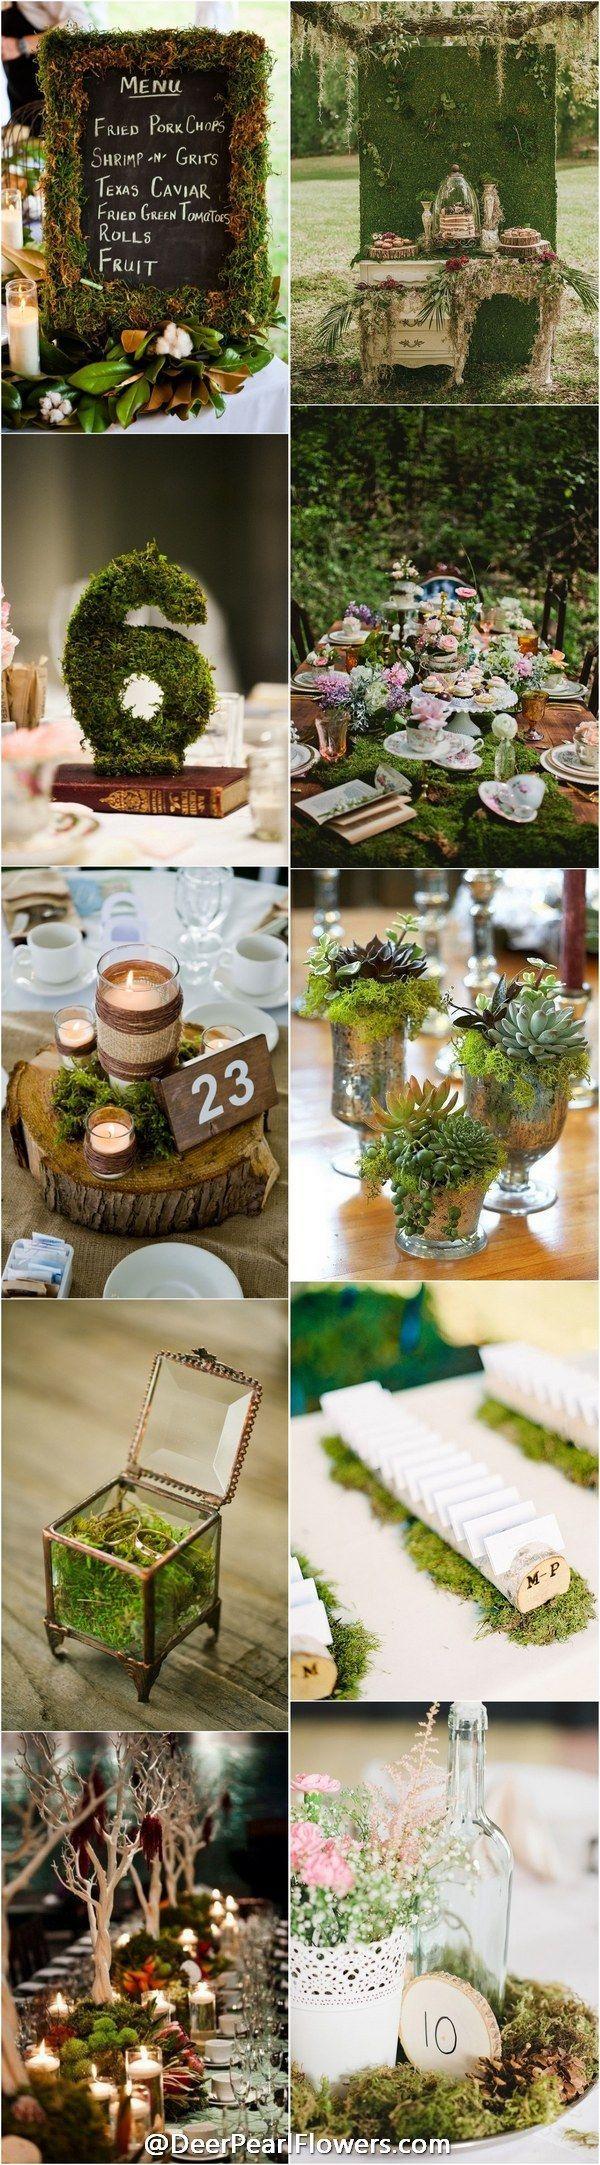 woodland moss wedding ideas - rustic country wedding ideas  / http://www.deerpearlflowers.com/moss-decor-ideas-for-a-nature-wedding/